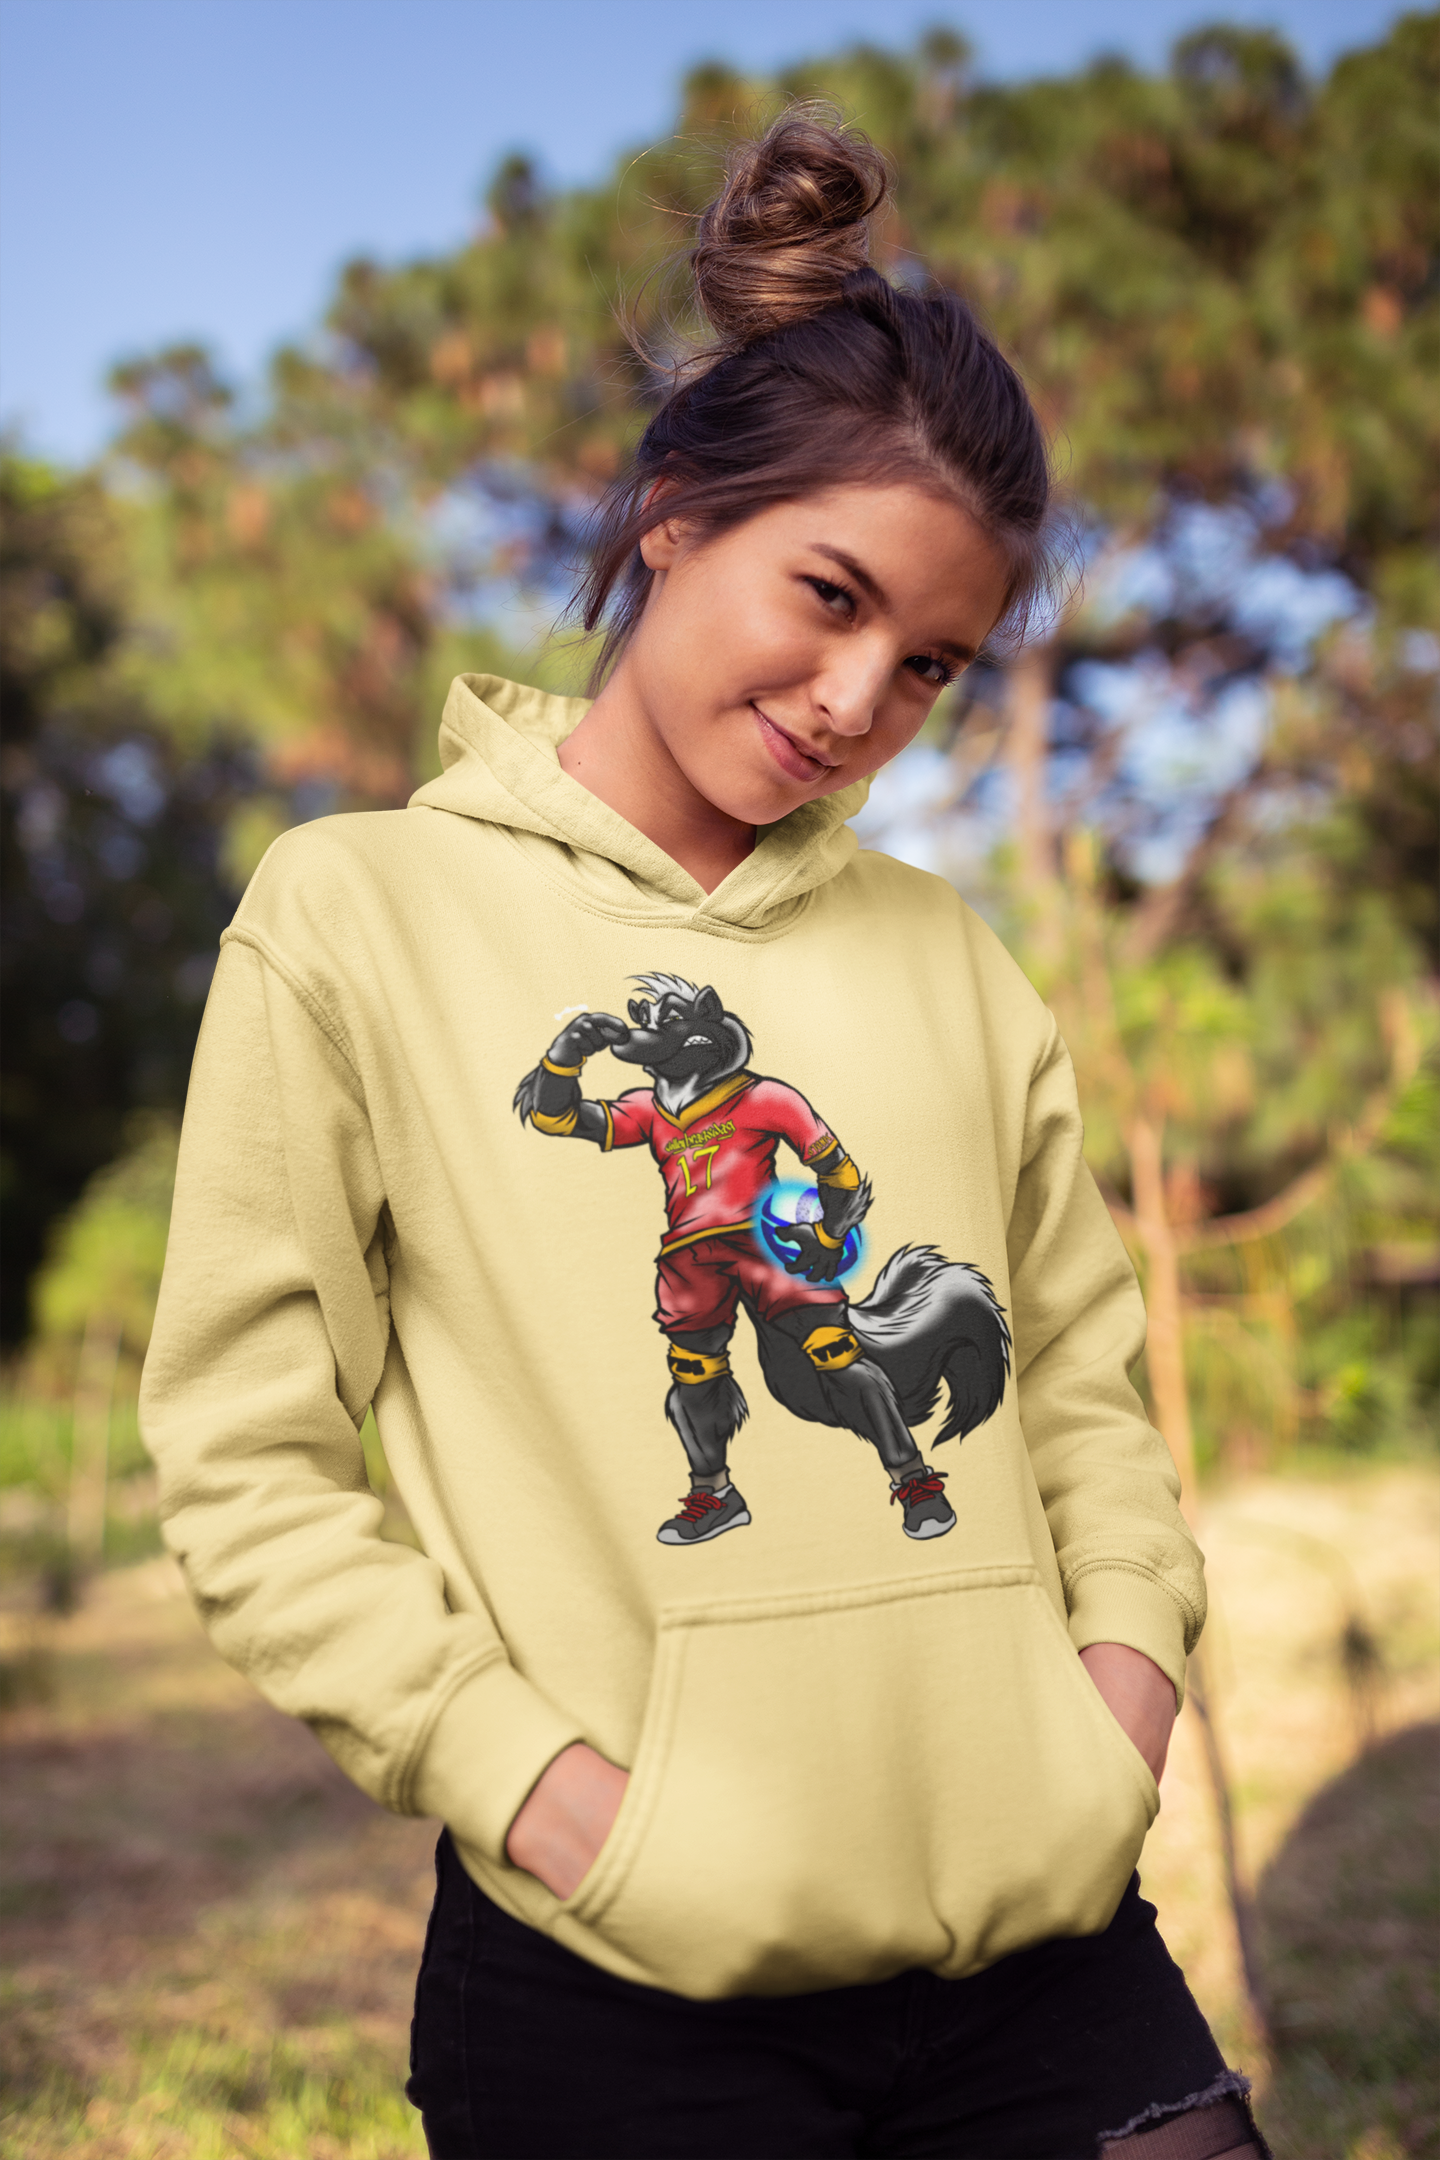 Shop your next Volleybragswag skunk shirt now!